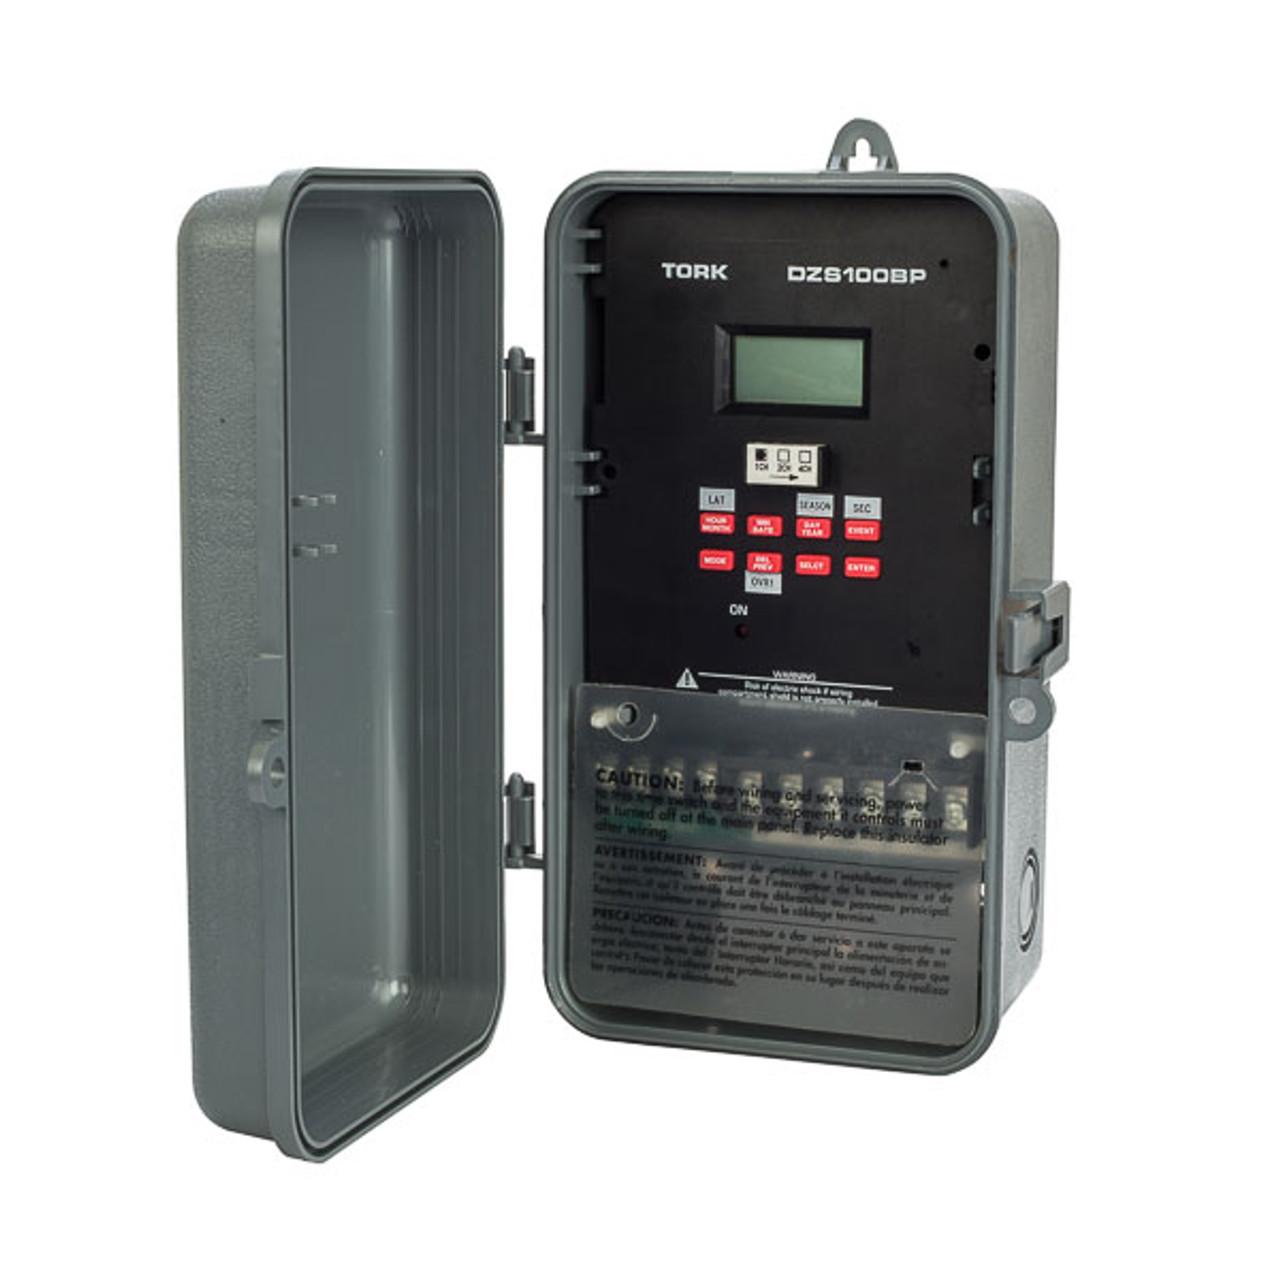 Tork DZS200BP, 2 Channel Multipurpose Control